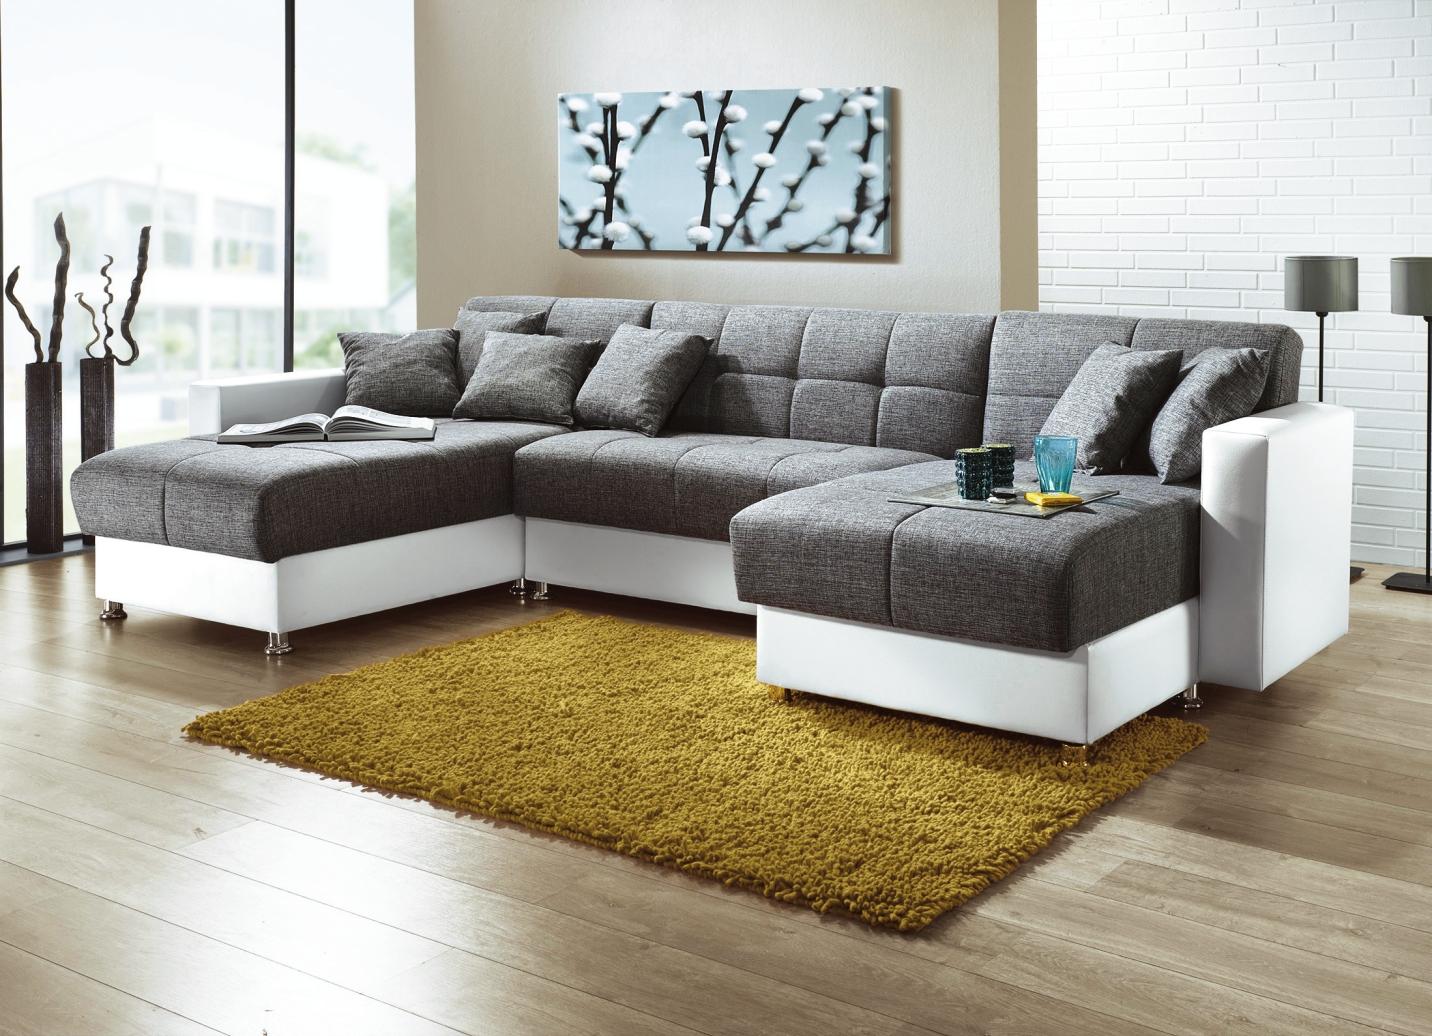 polsterm bel in verschiedenen ausf hrungen moderne m bel bader. Black Bedroom Furniture Sets. Home Design Ideas